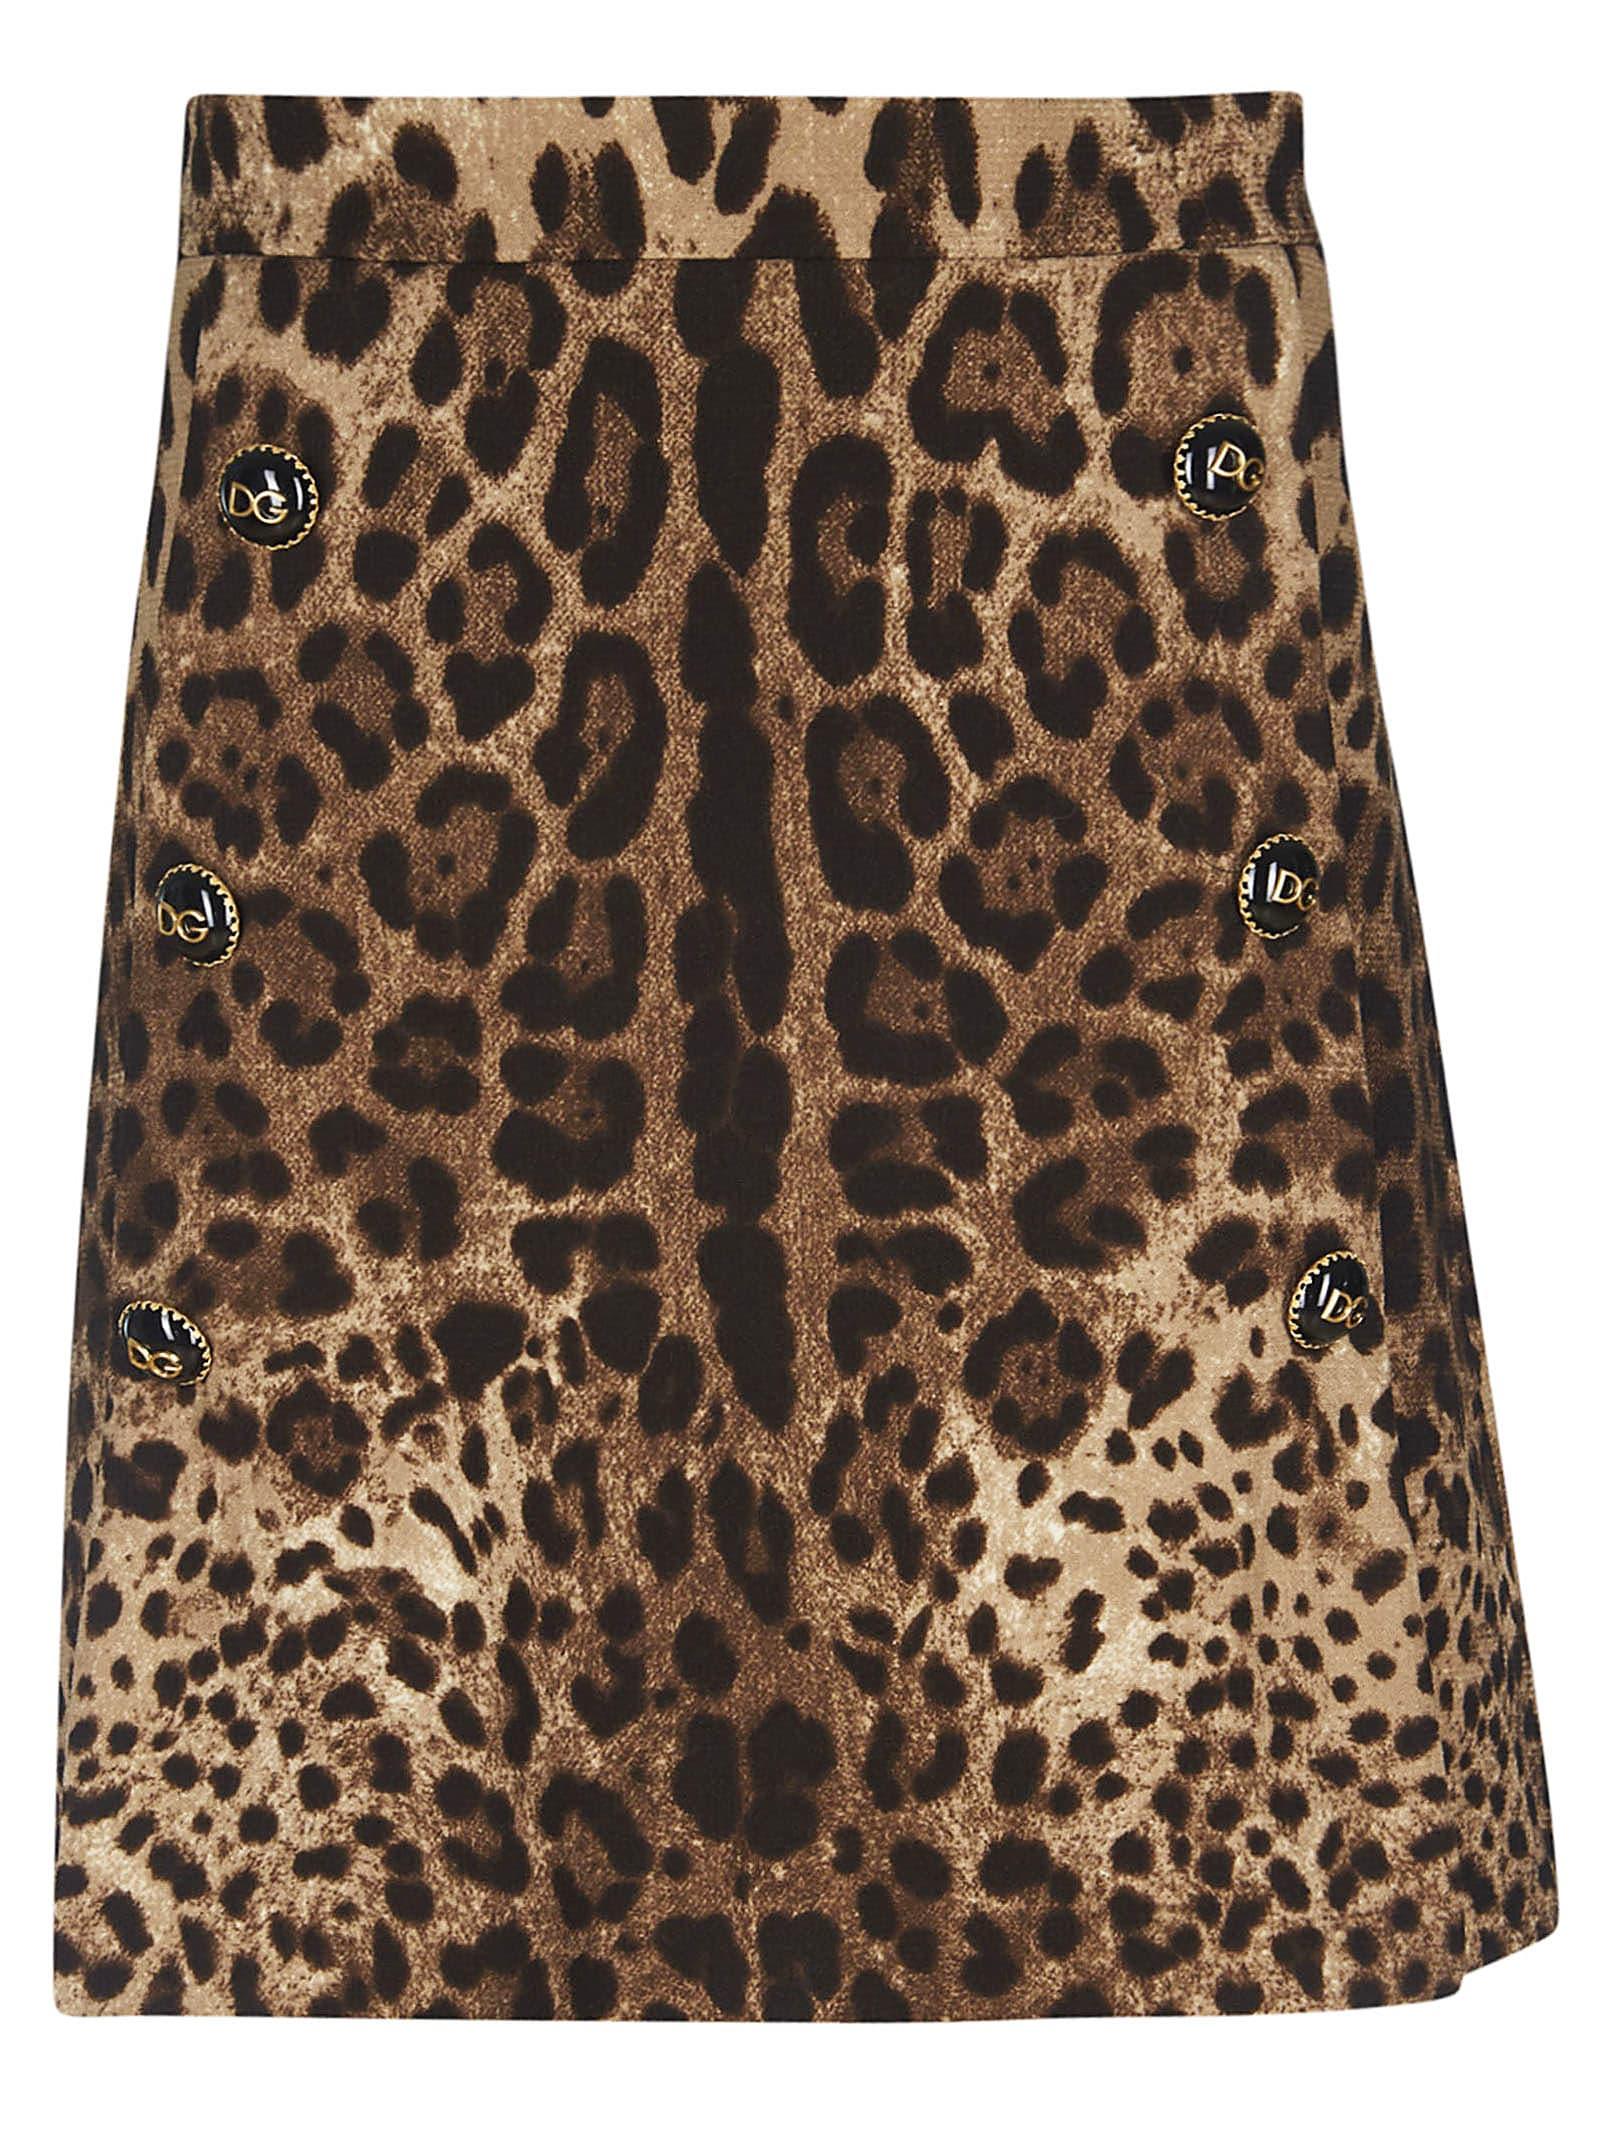 Dolce & Gabbana Leopard Skirt